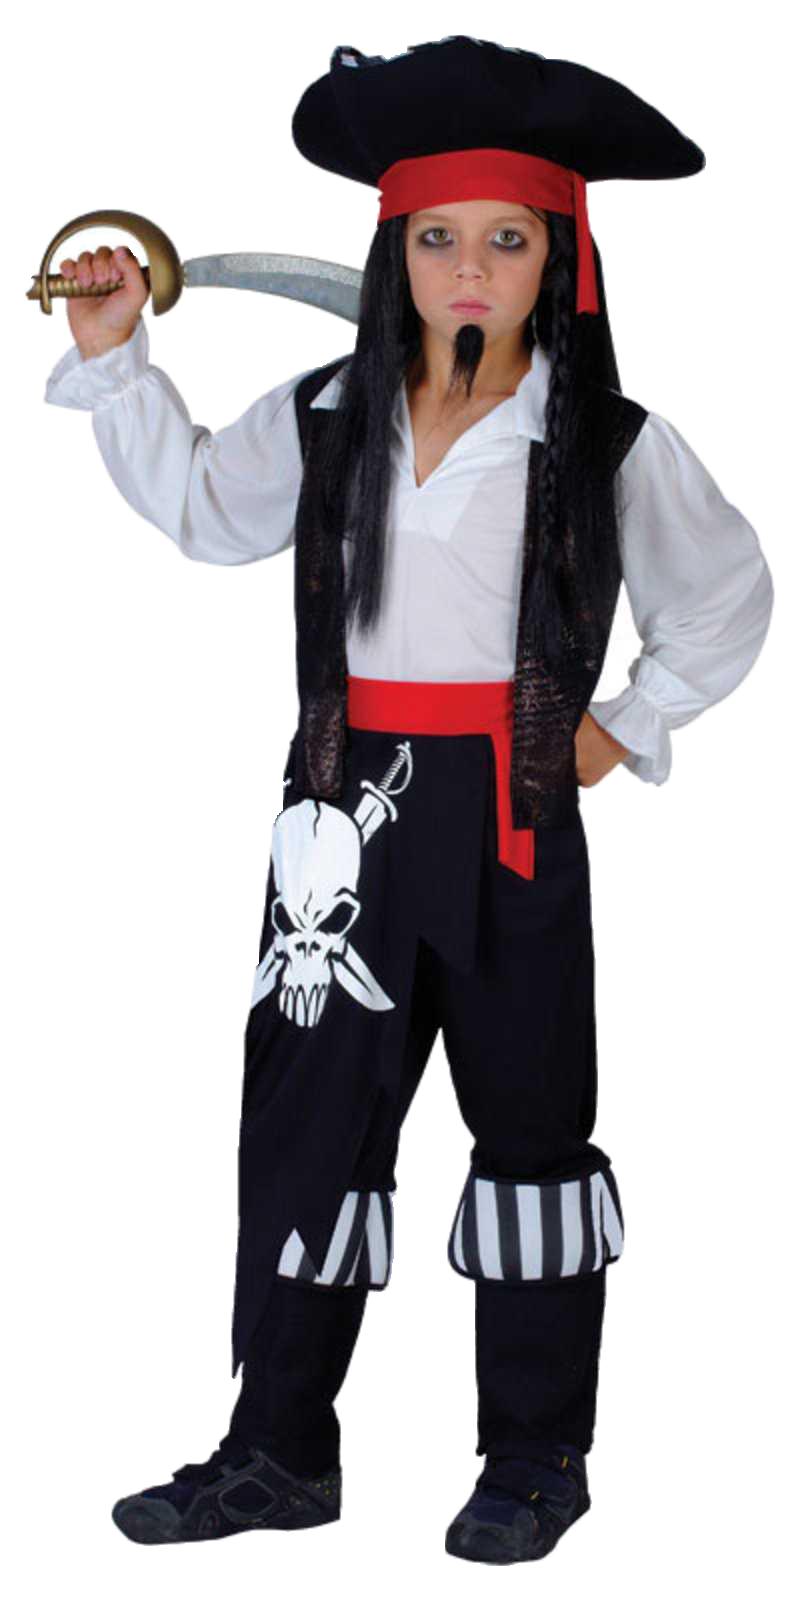 Kid Halloween Cosplay Deluxe Pirate Costume for Halloween Day